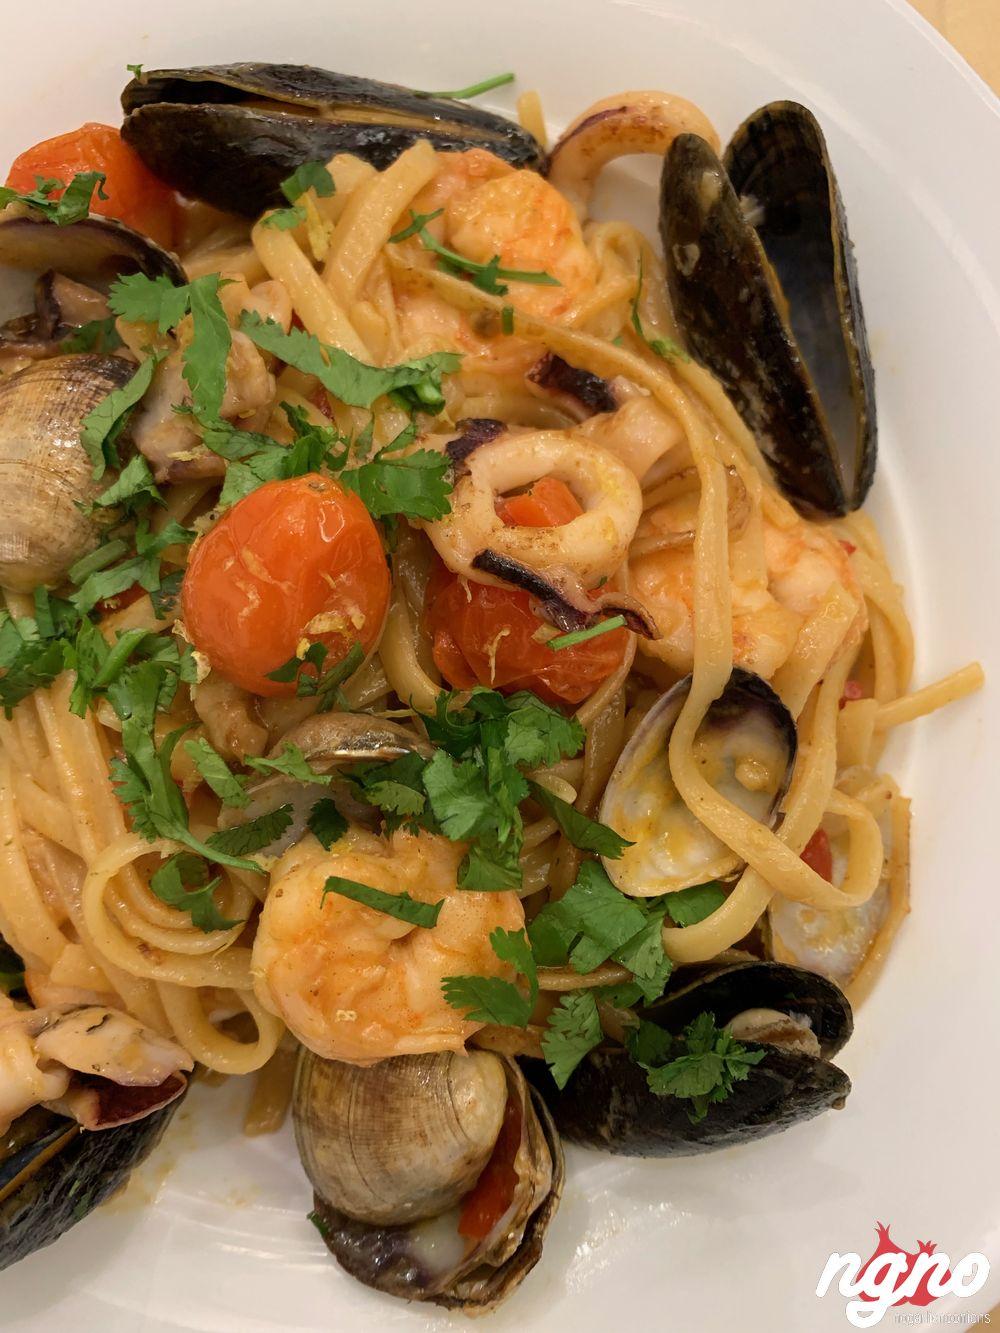 merou-seafood-mar-mikhael-nogarlicnoonions-742019-03-13-07-35-49